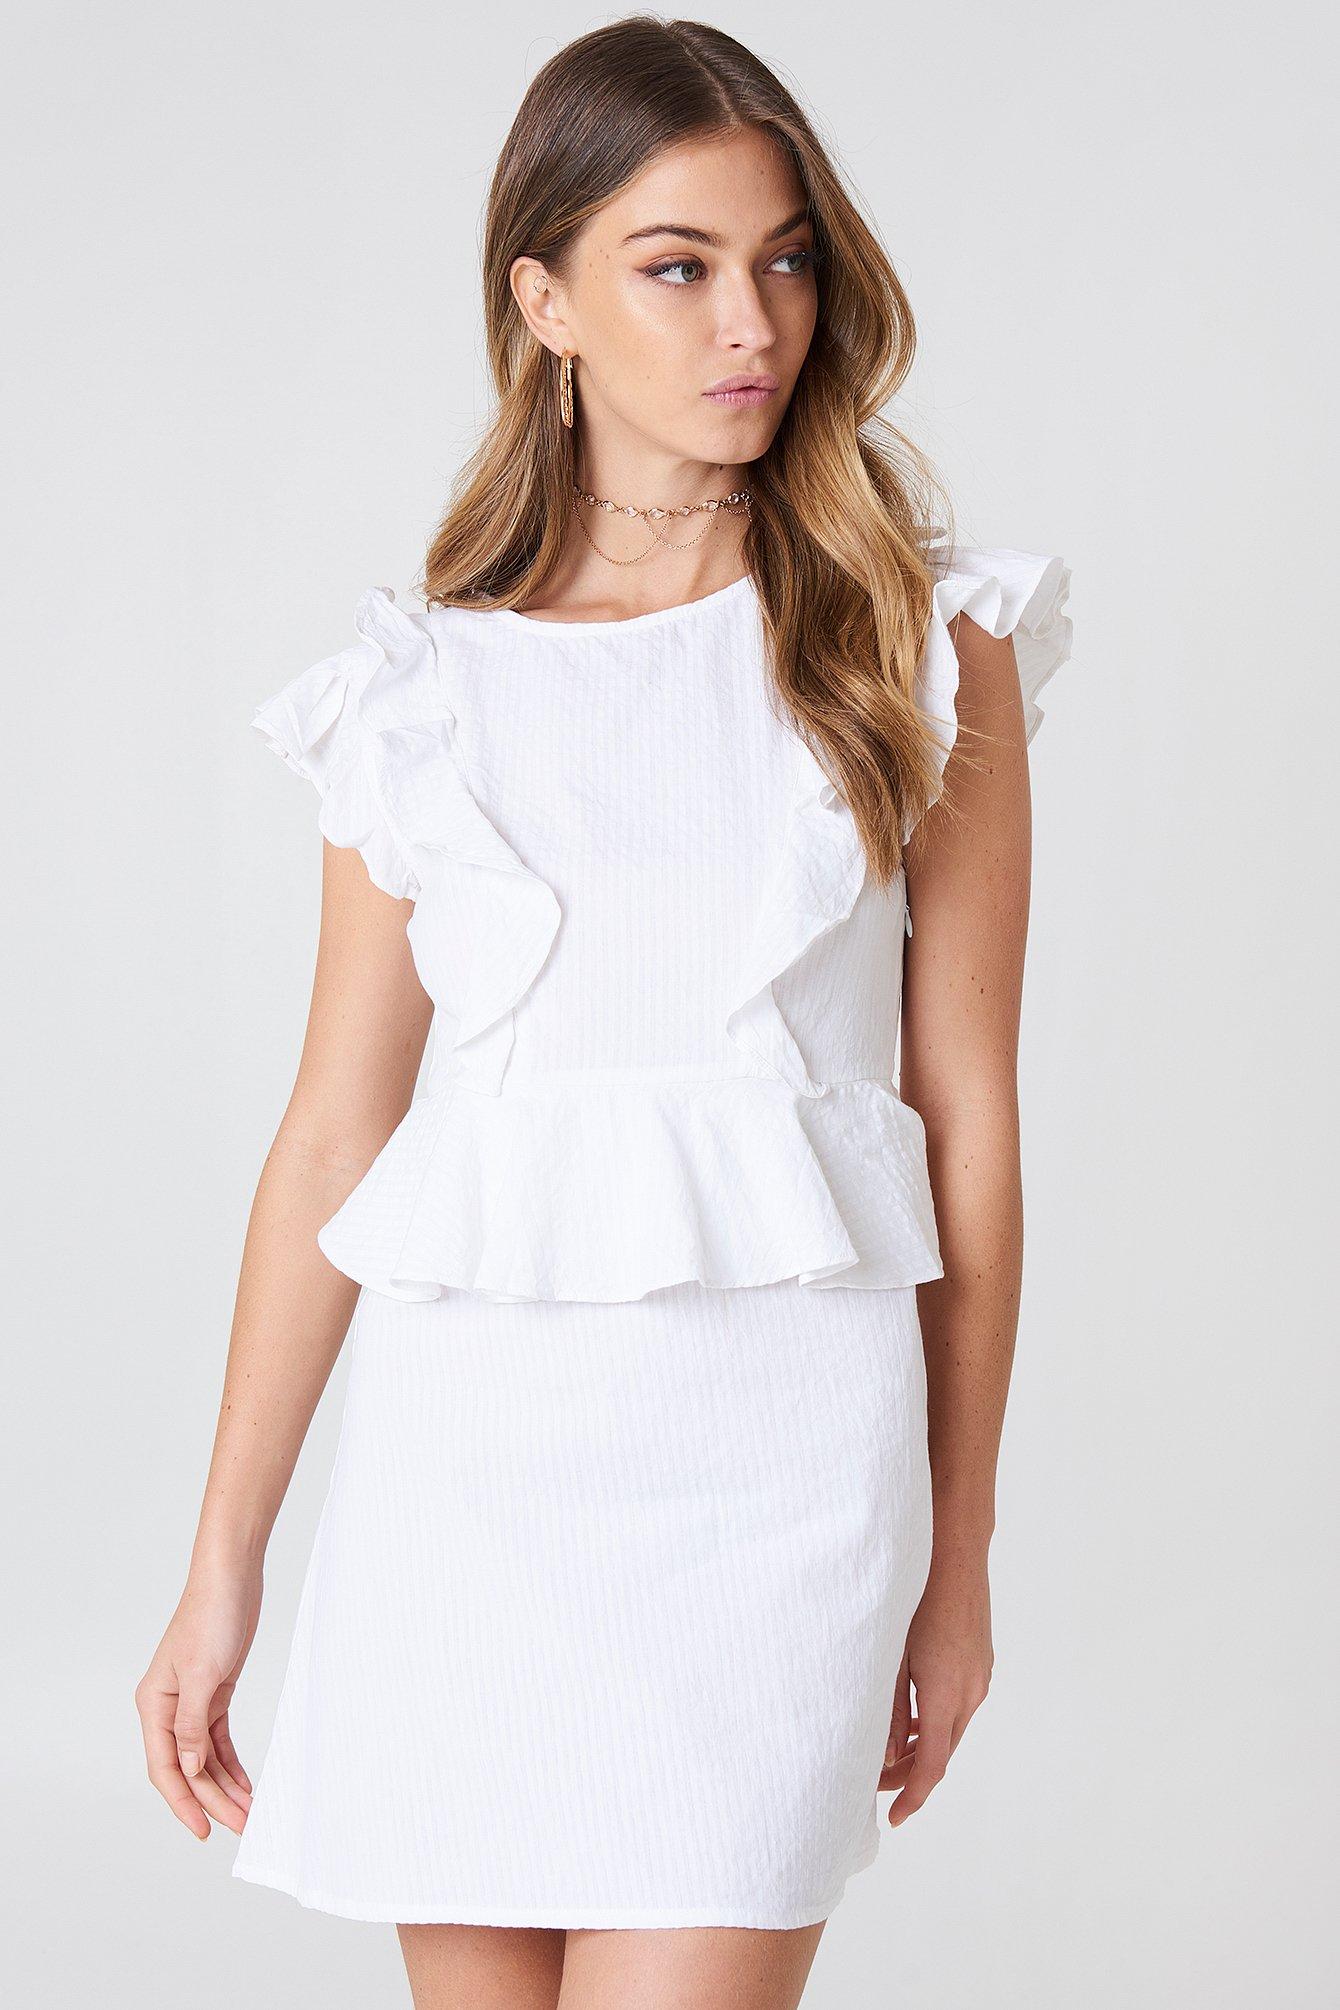 d03c4c1f0b2 Flounce Dress White